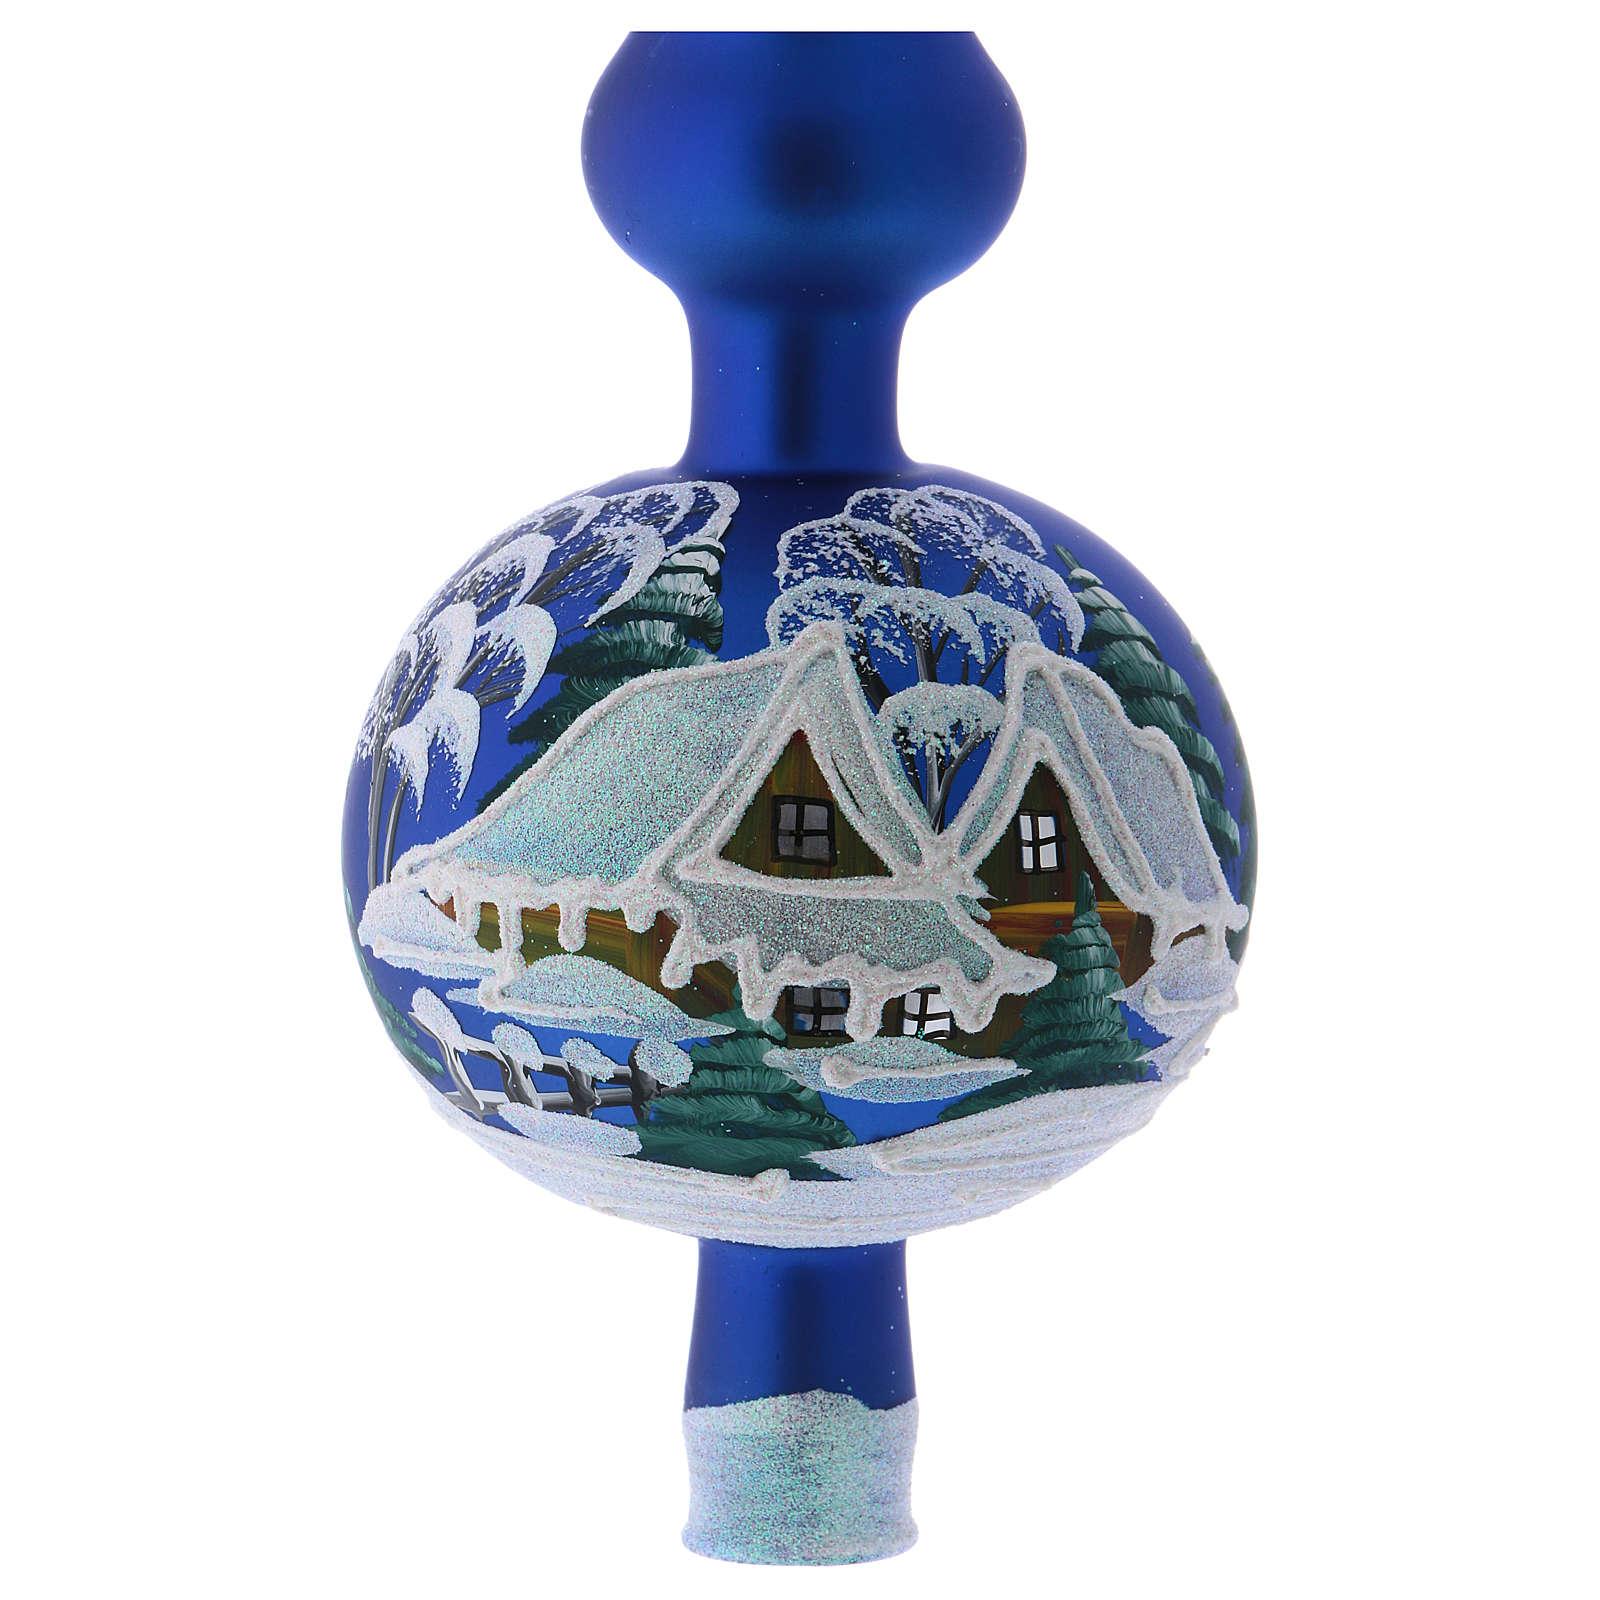 Punta Árbol de Navidad vidrio soplado azul paisaje nevado 4